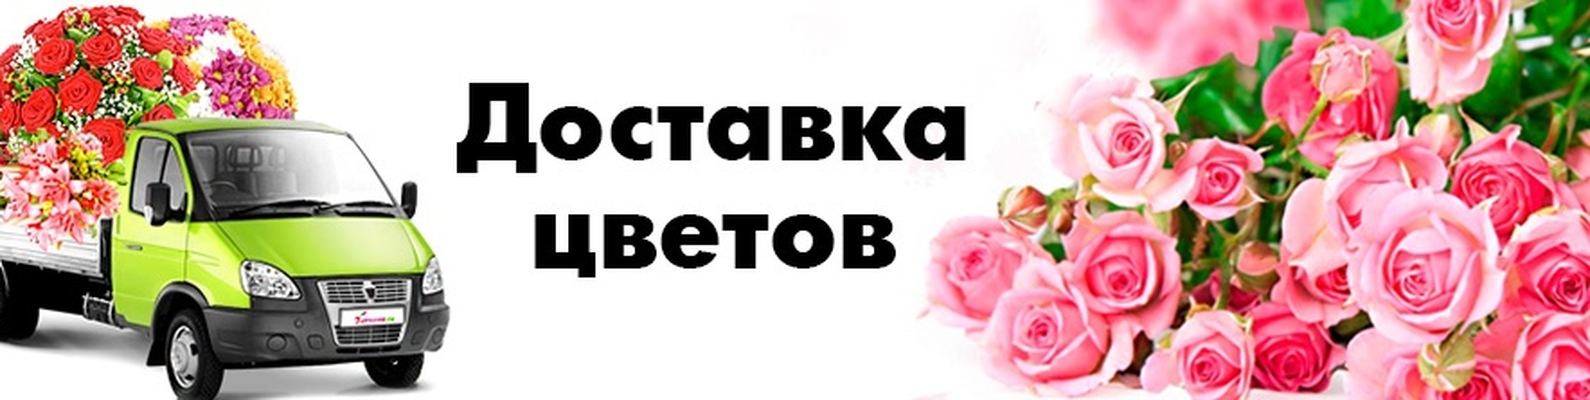 Картинка доставка цветов